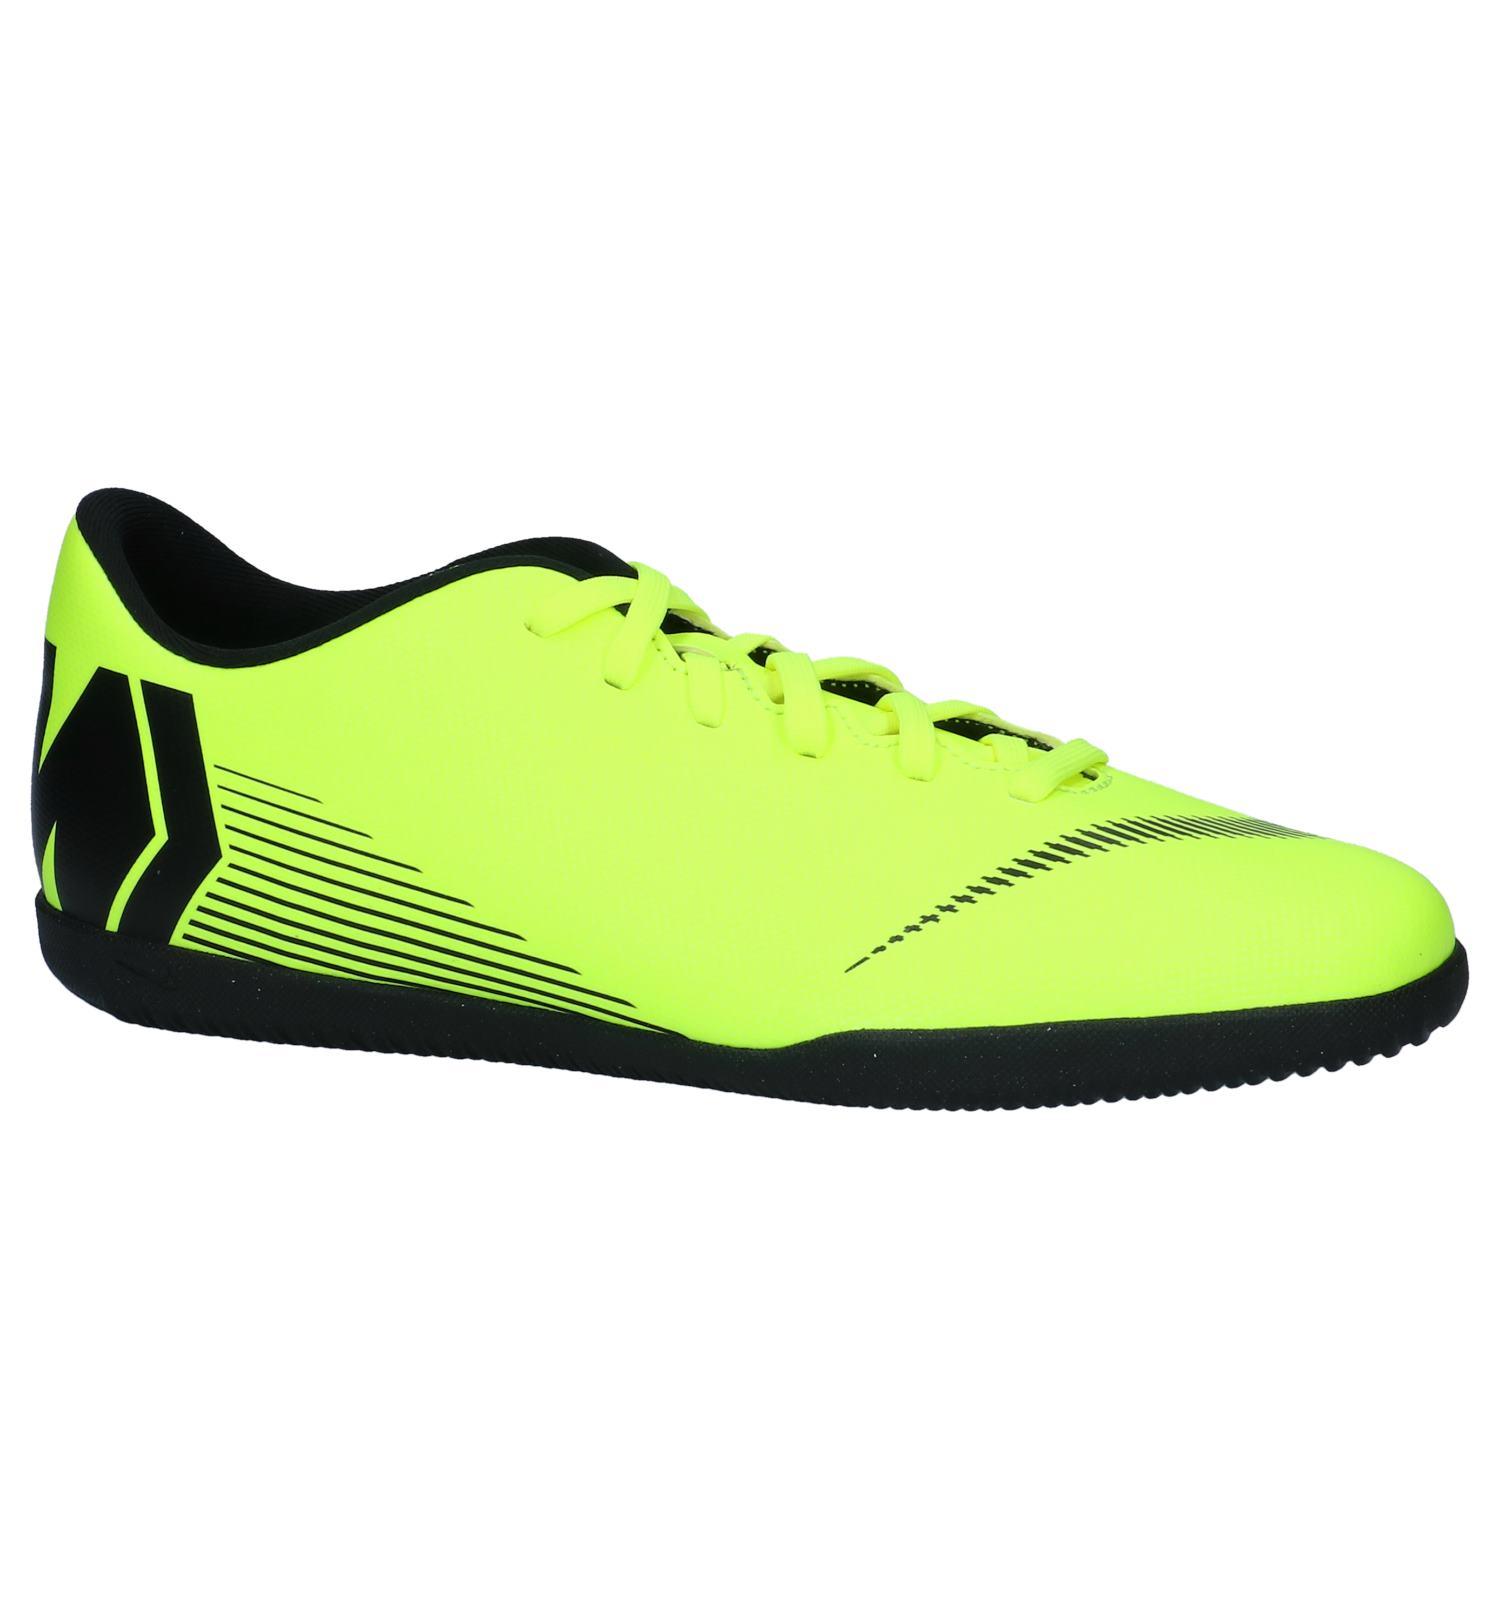 be Nike De Et Livraison Footjaune Chaussures FluoTorfs IYbf7yg6v